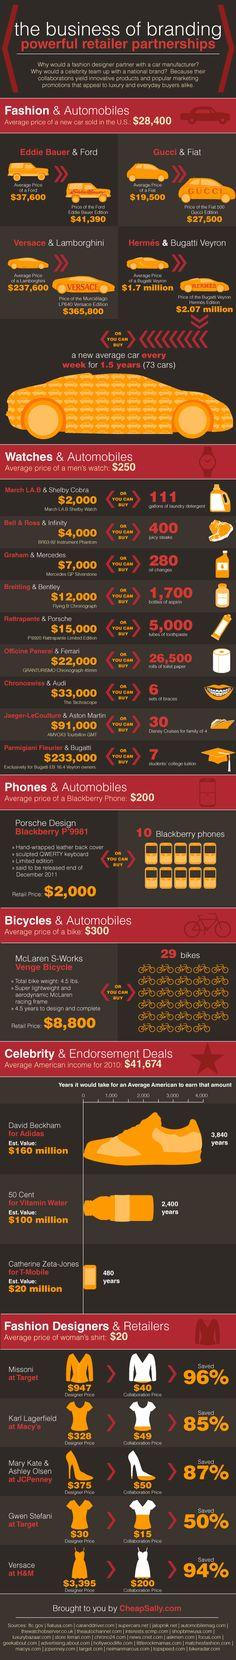 { ☂ The Business of Branding | Branding | #Infographic ... }